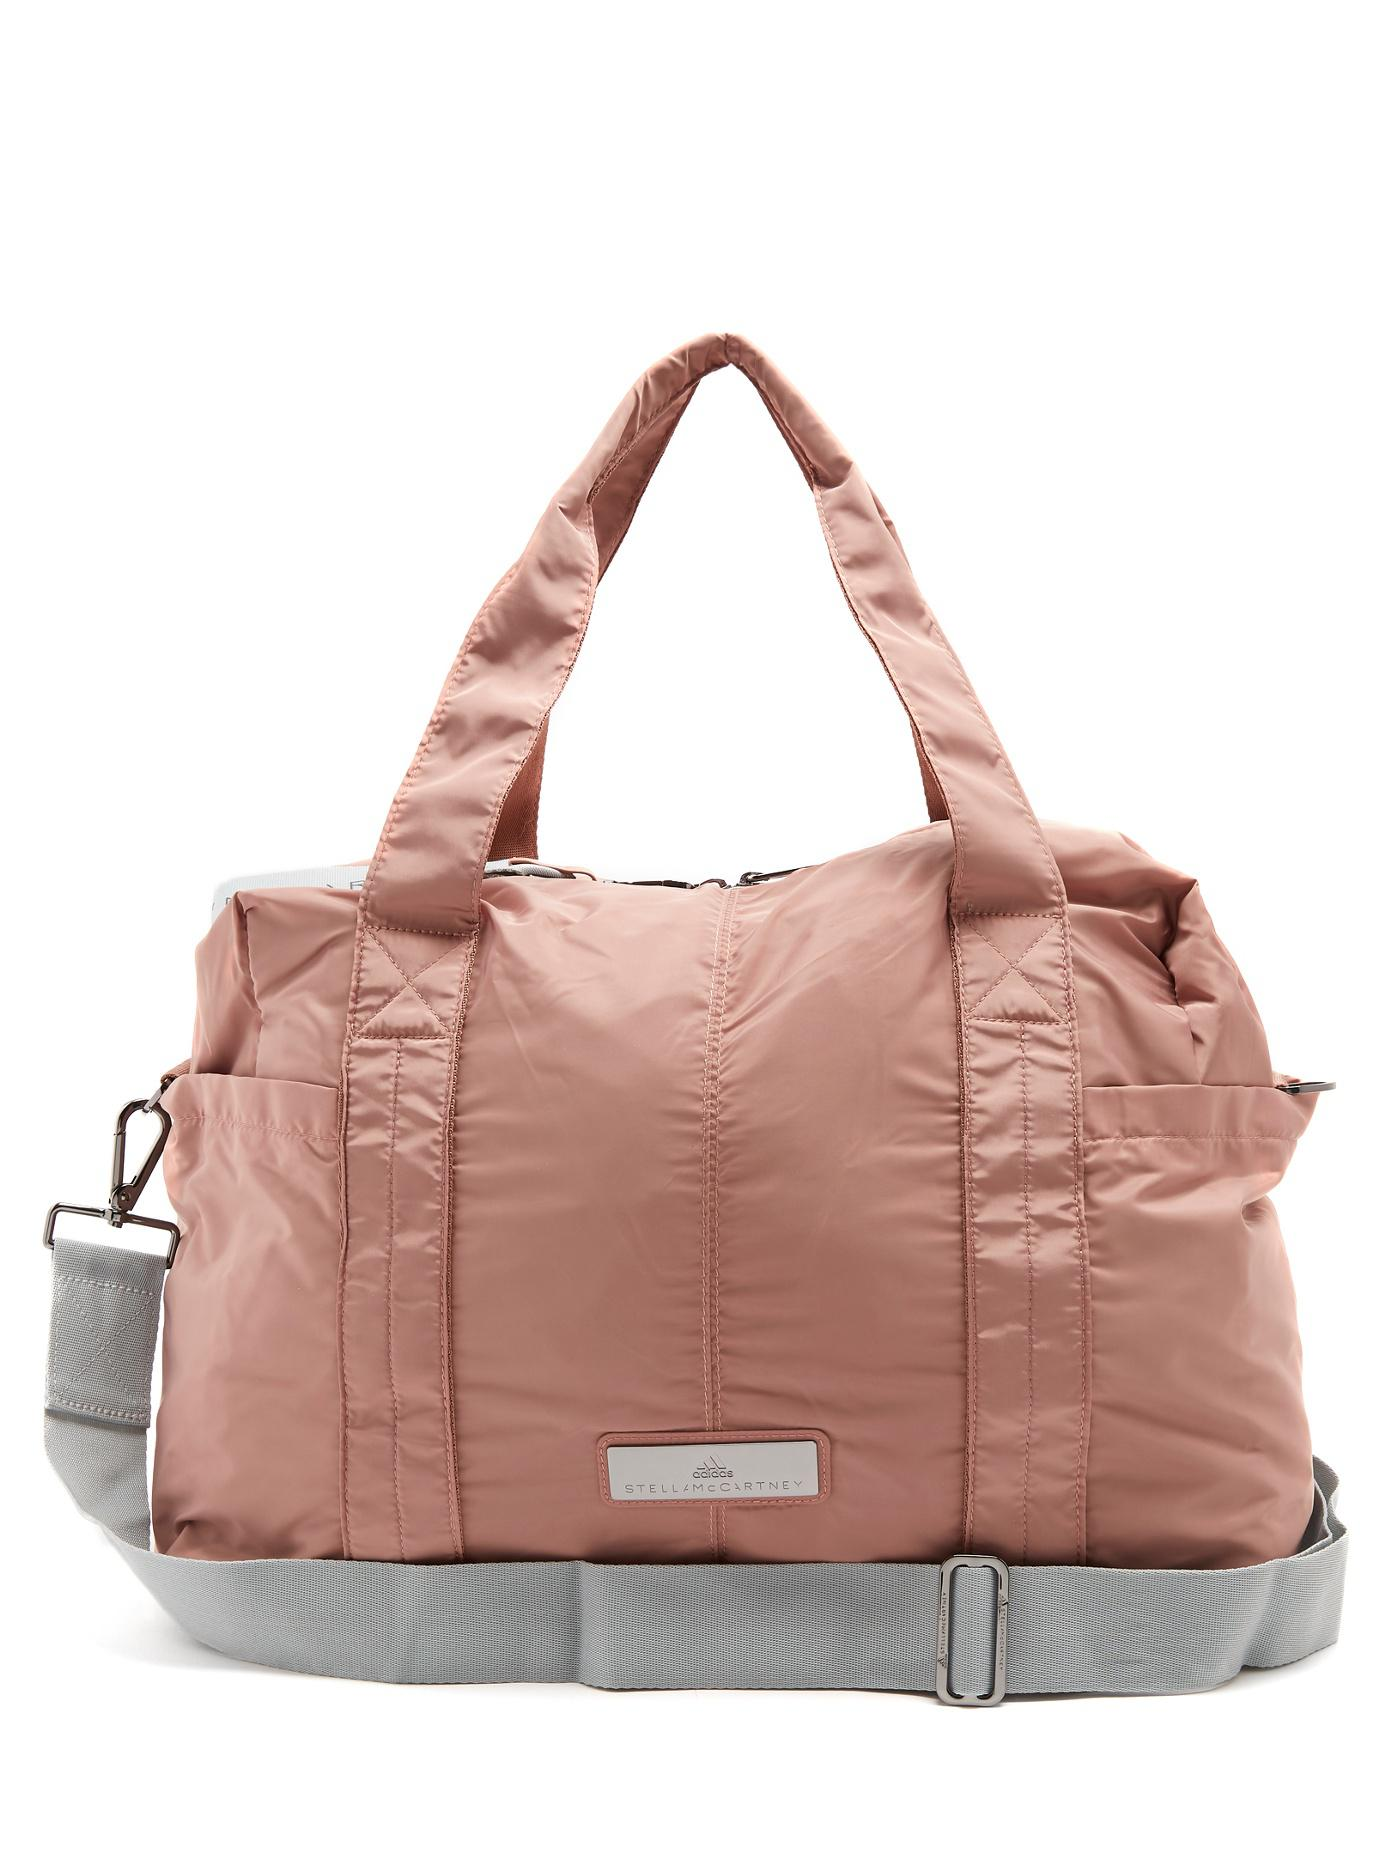 d6f197a427 Light Pink Adidas Gym Bag